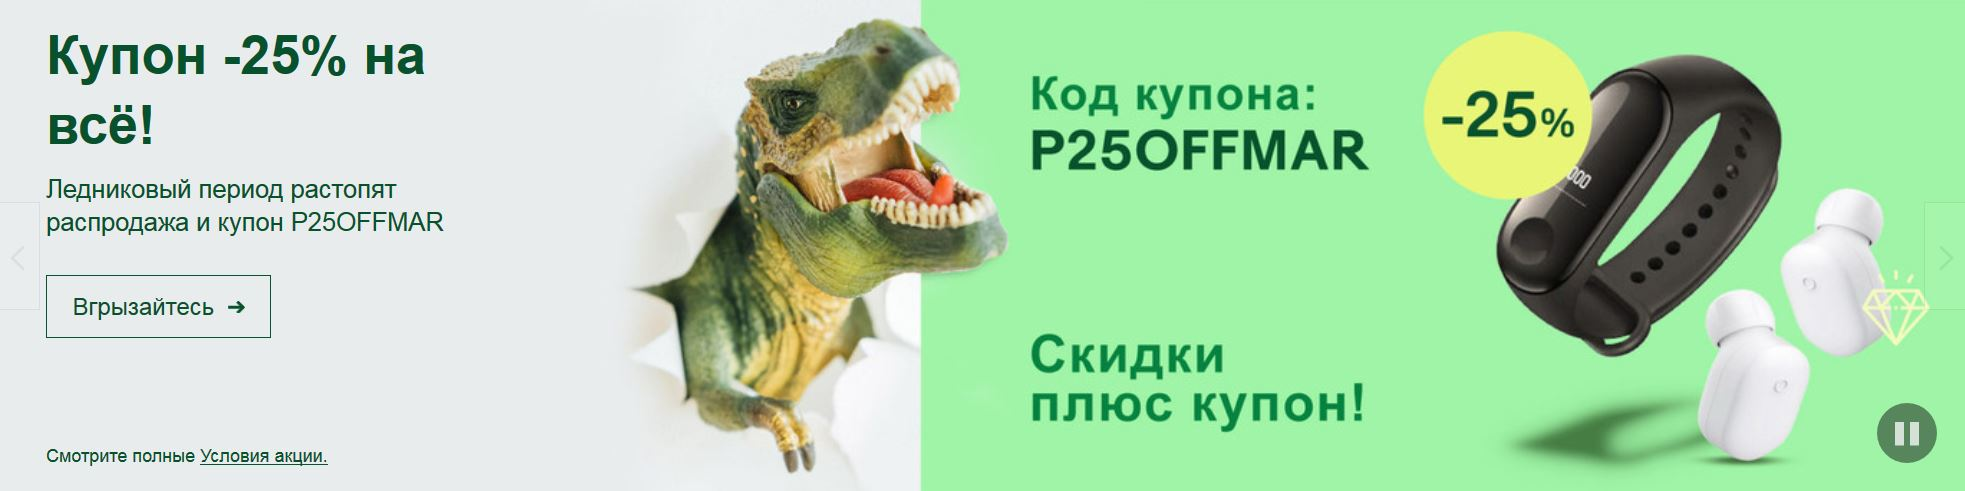 snimok1-jpg.383995